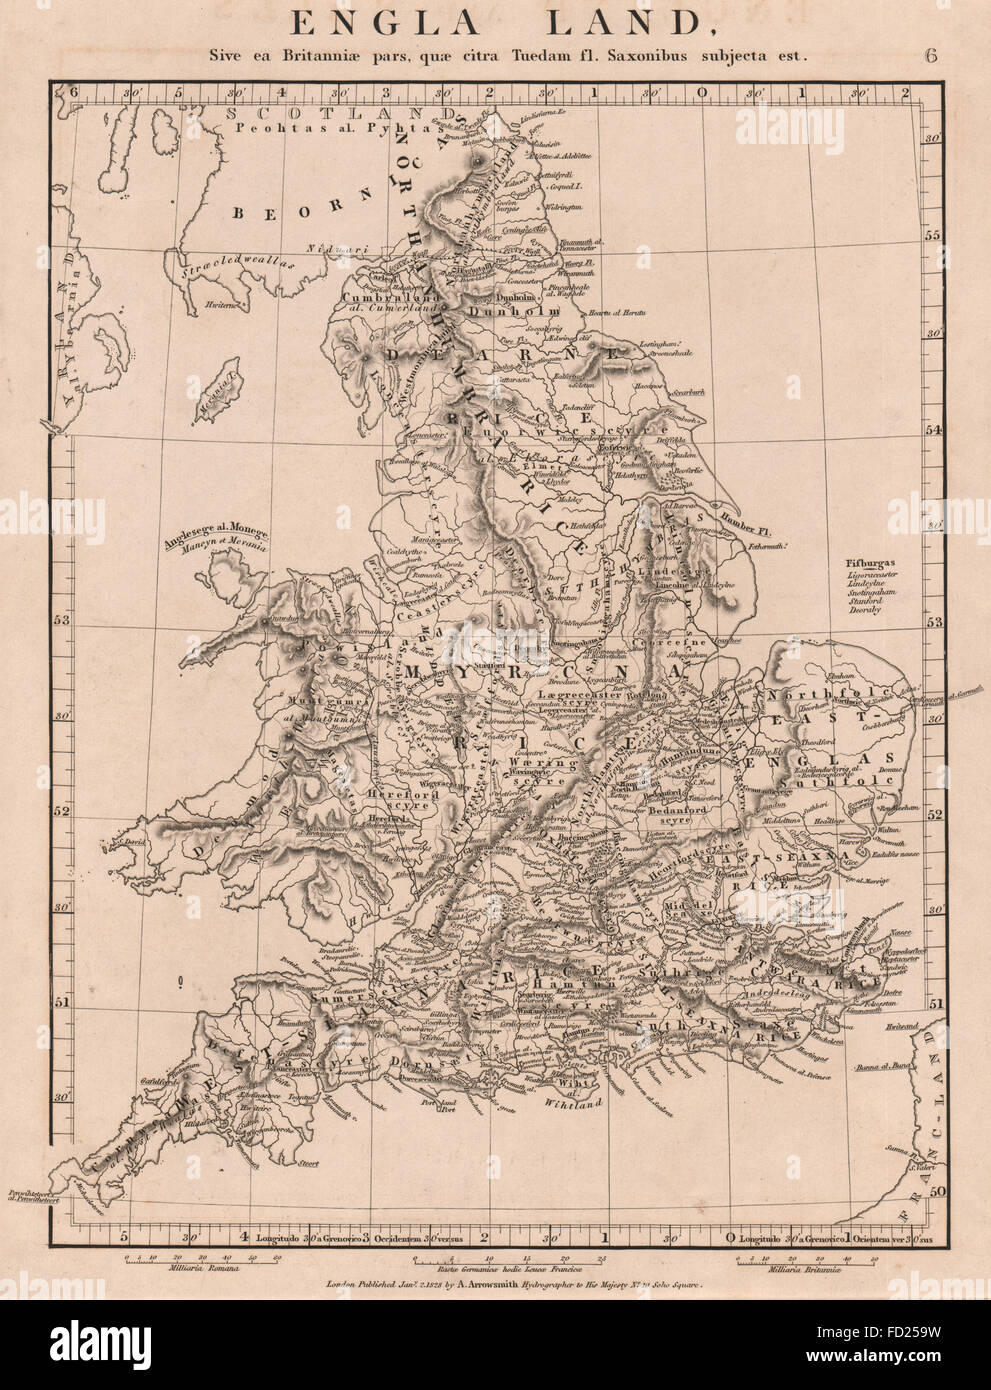 England English Map Stock Photos & England English Map Stock Images